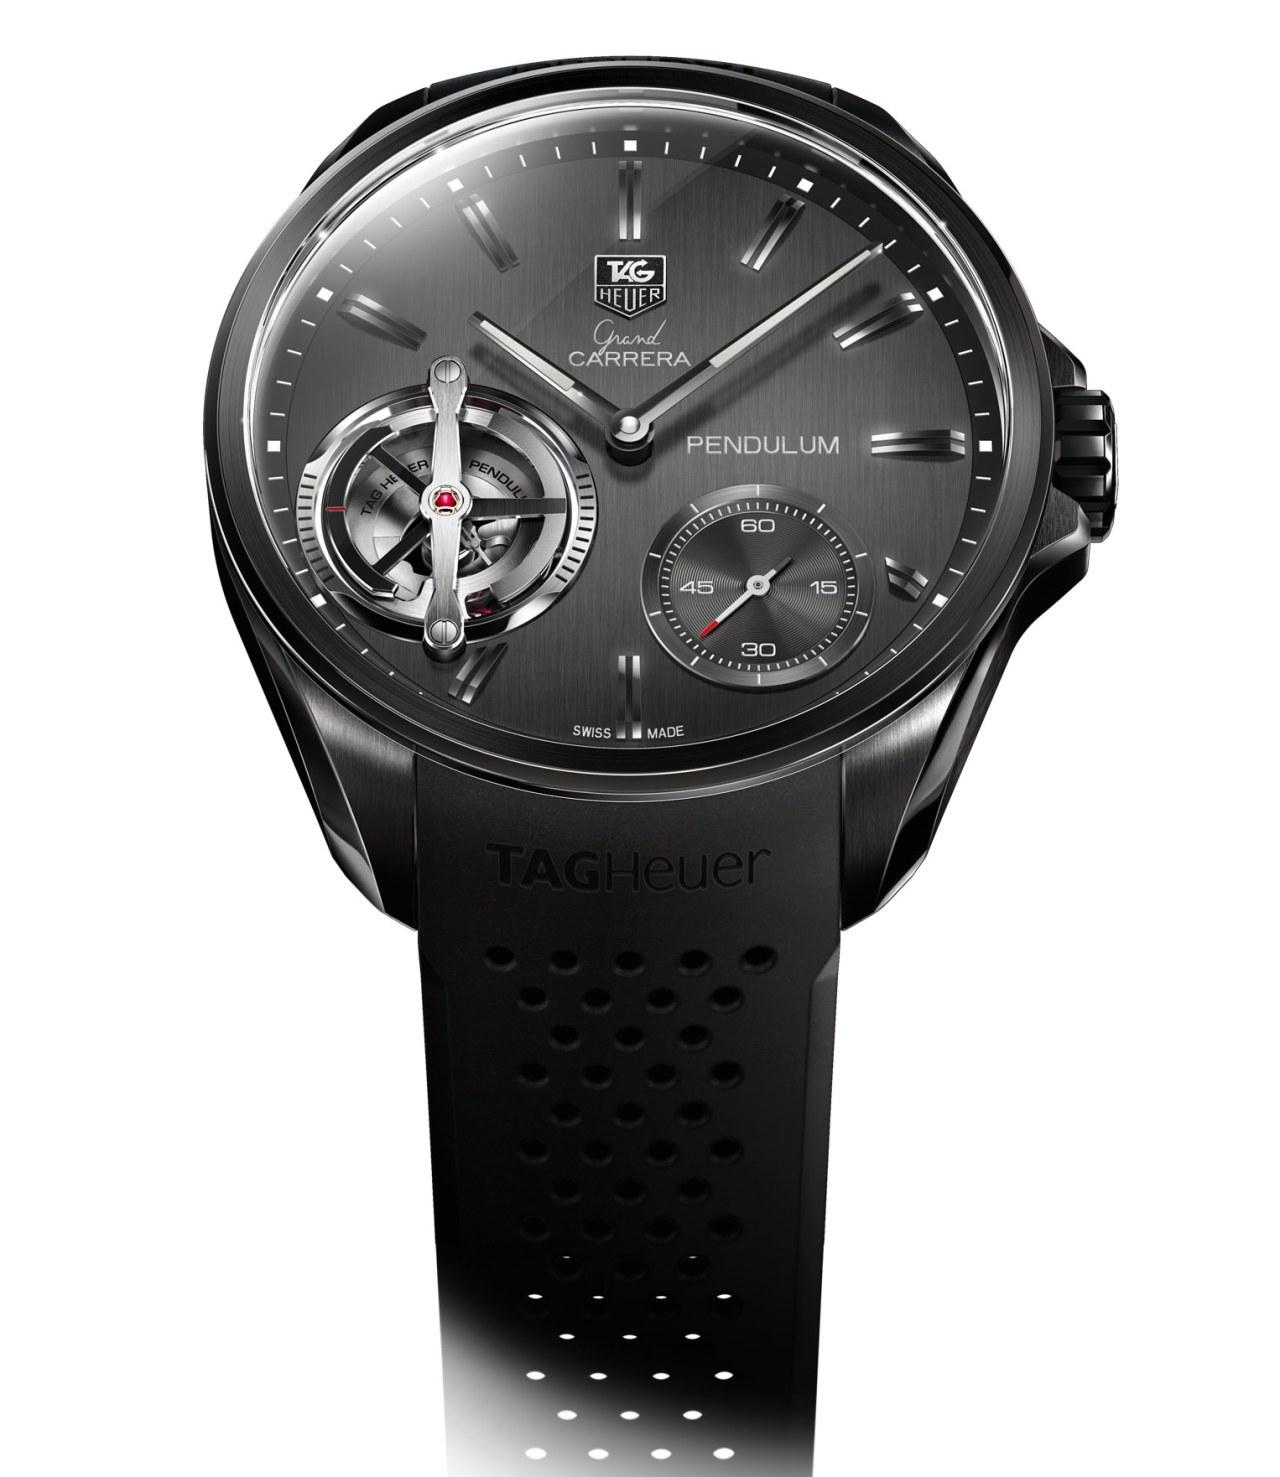 TAG-Heuer-Grand-Carrera-Pendulum-1-1